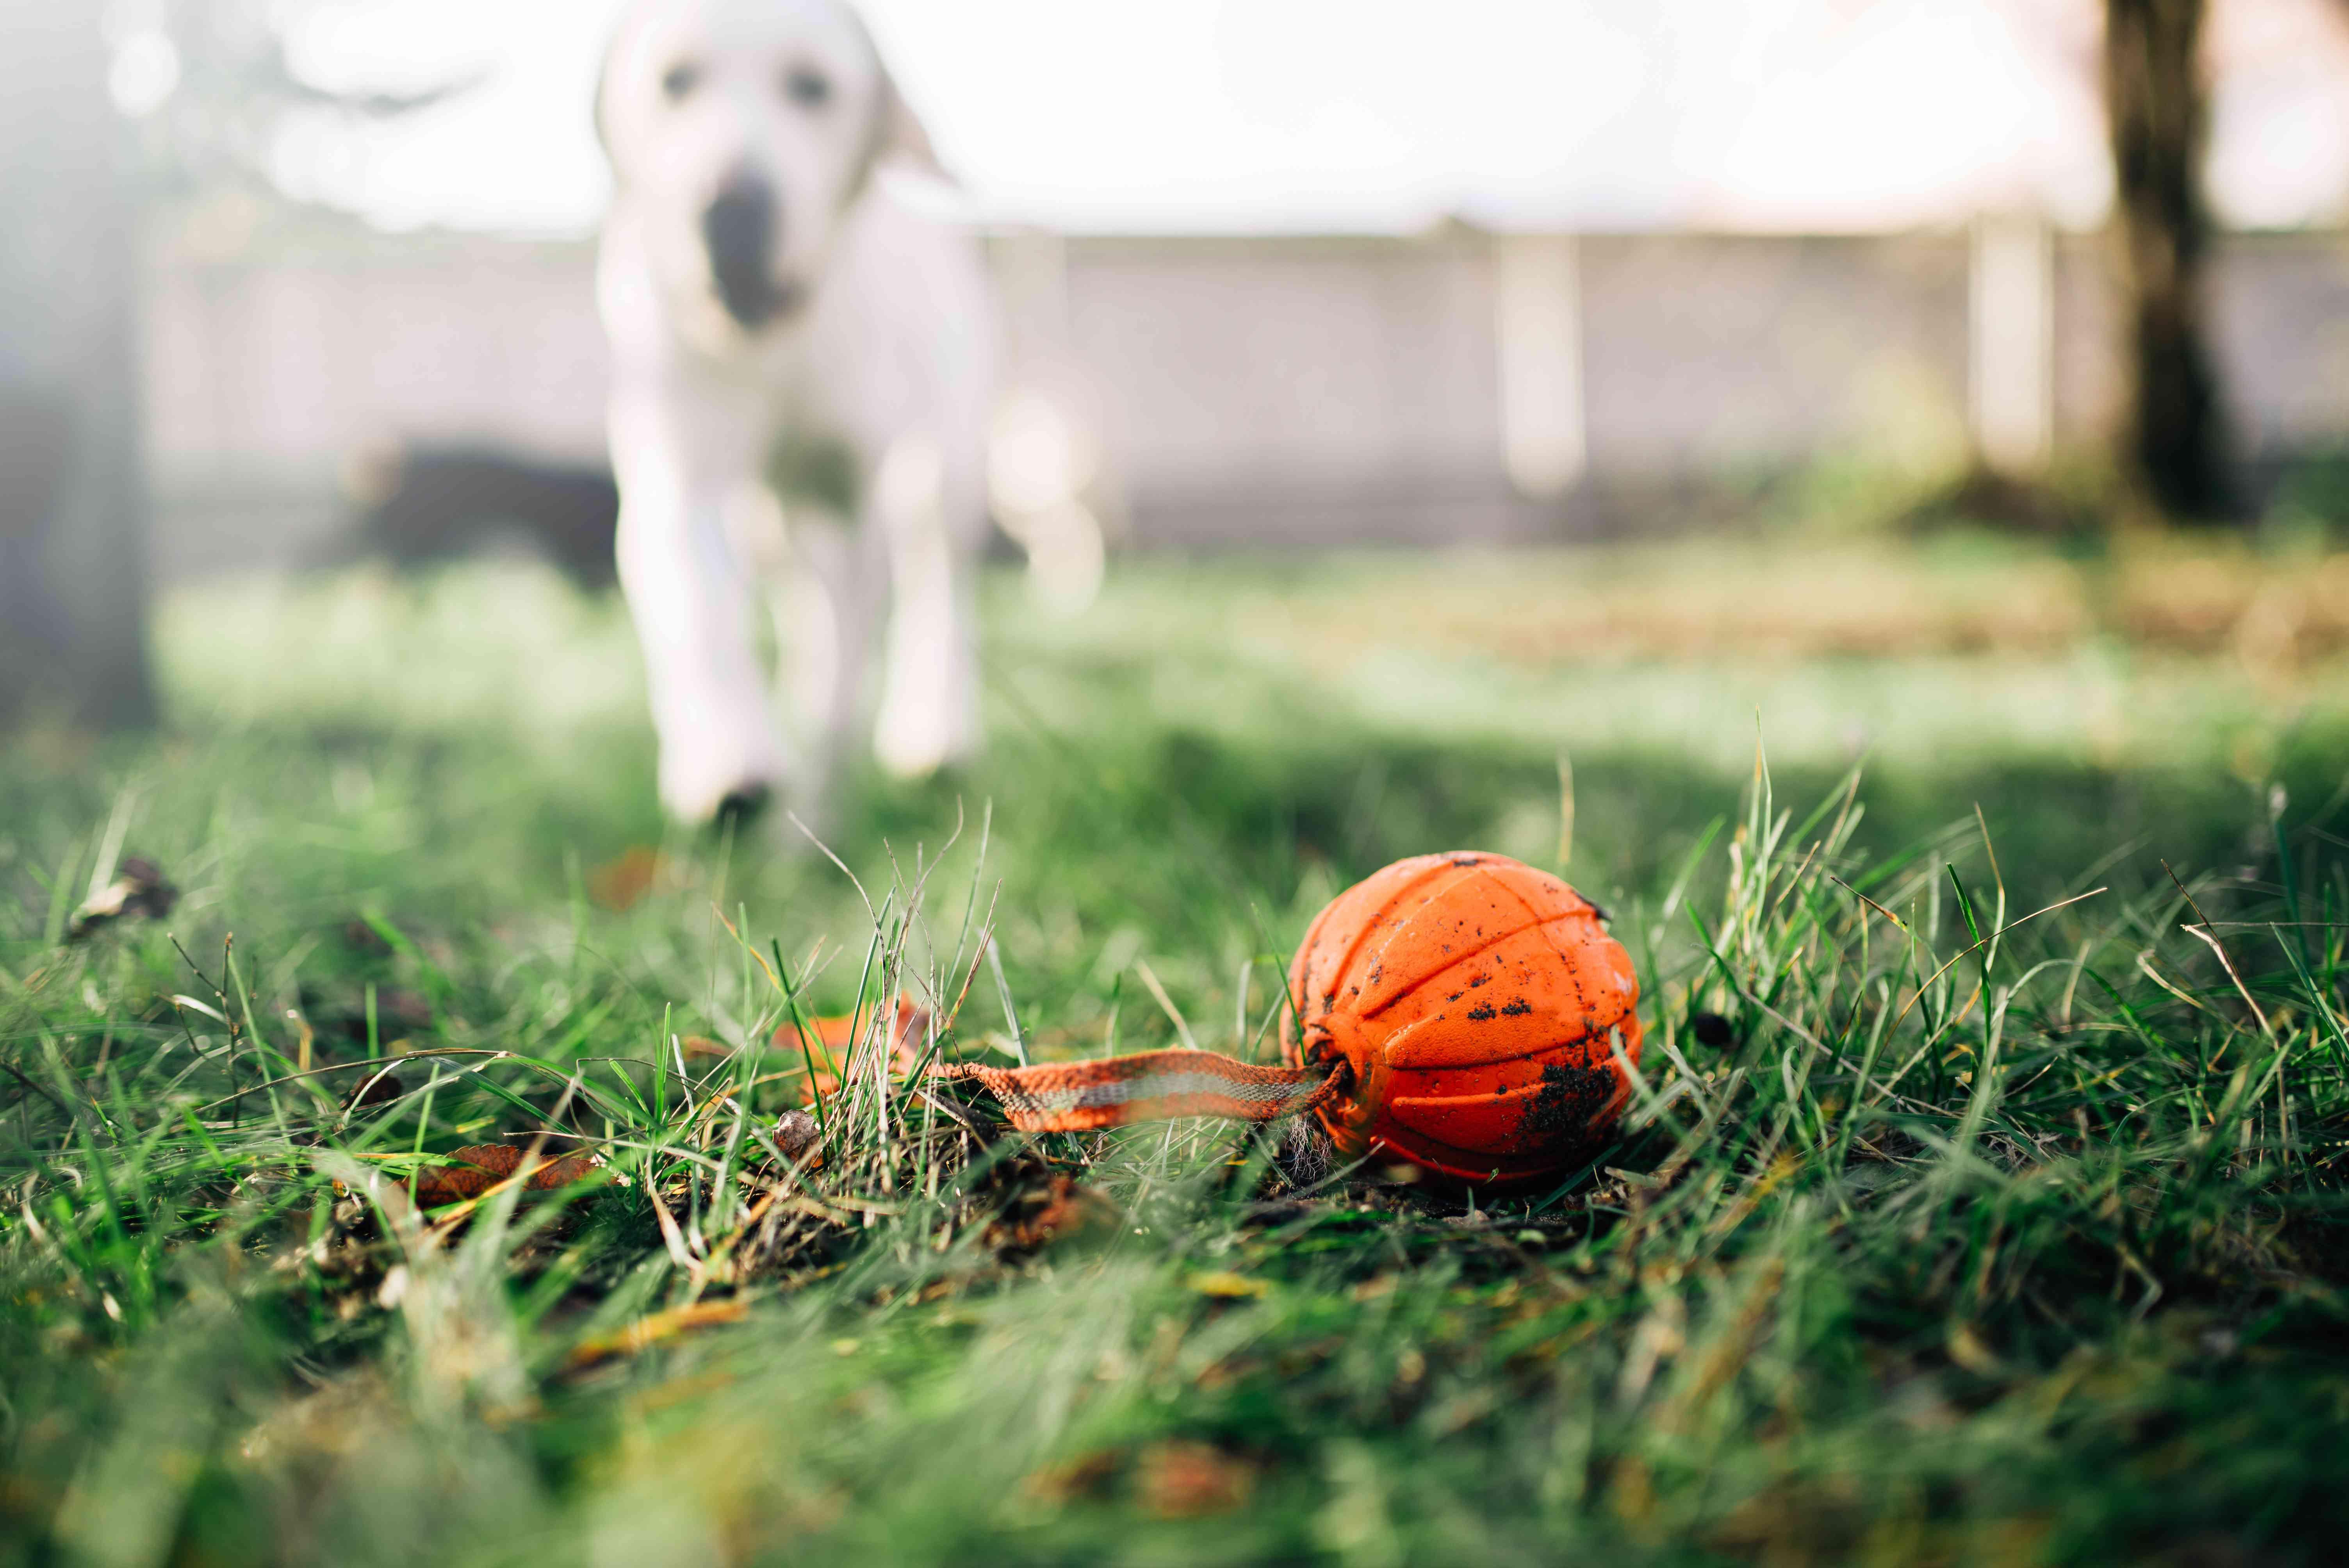 dog finds ball